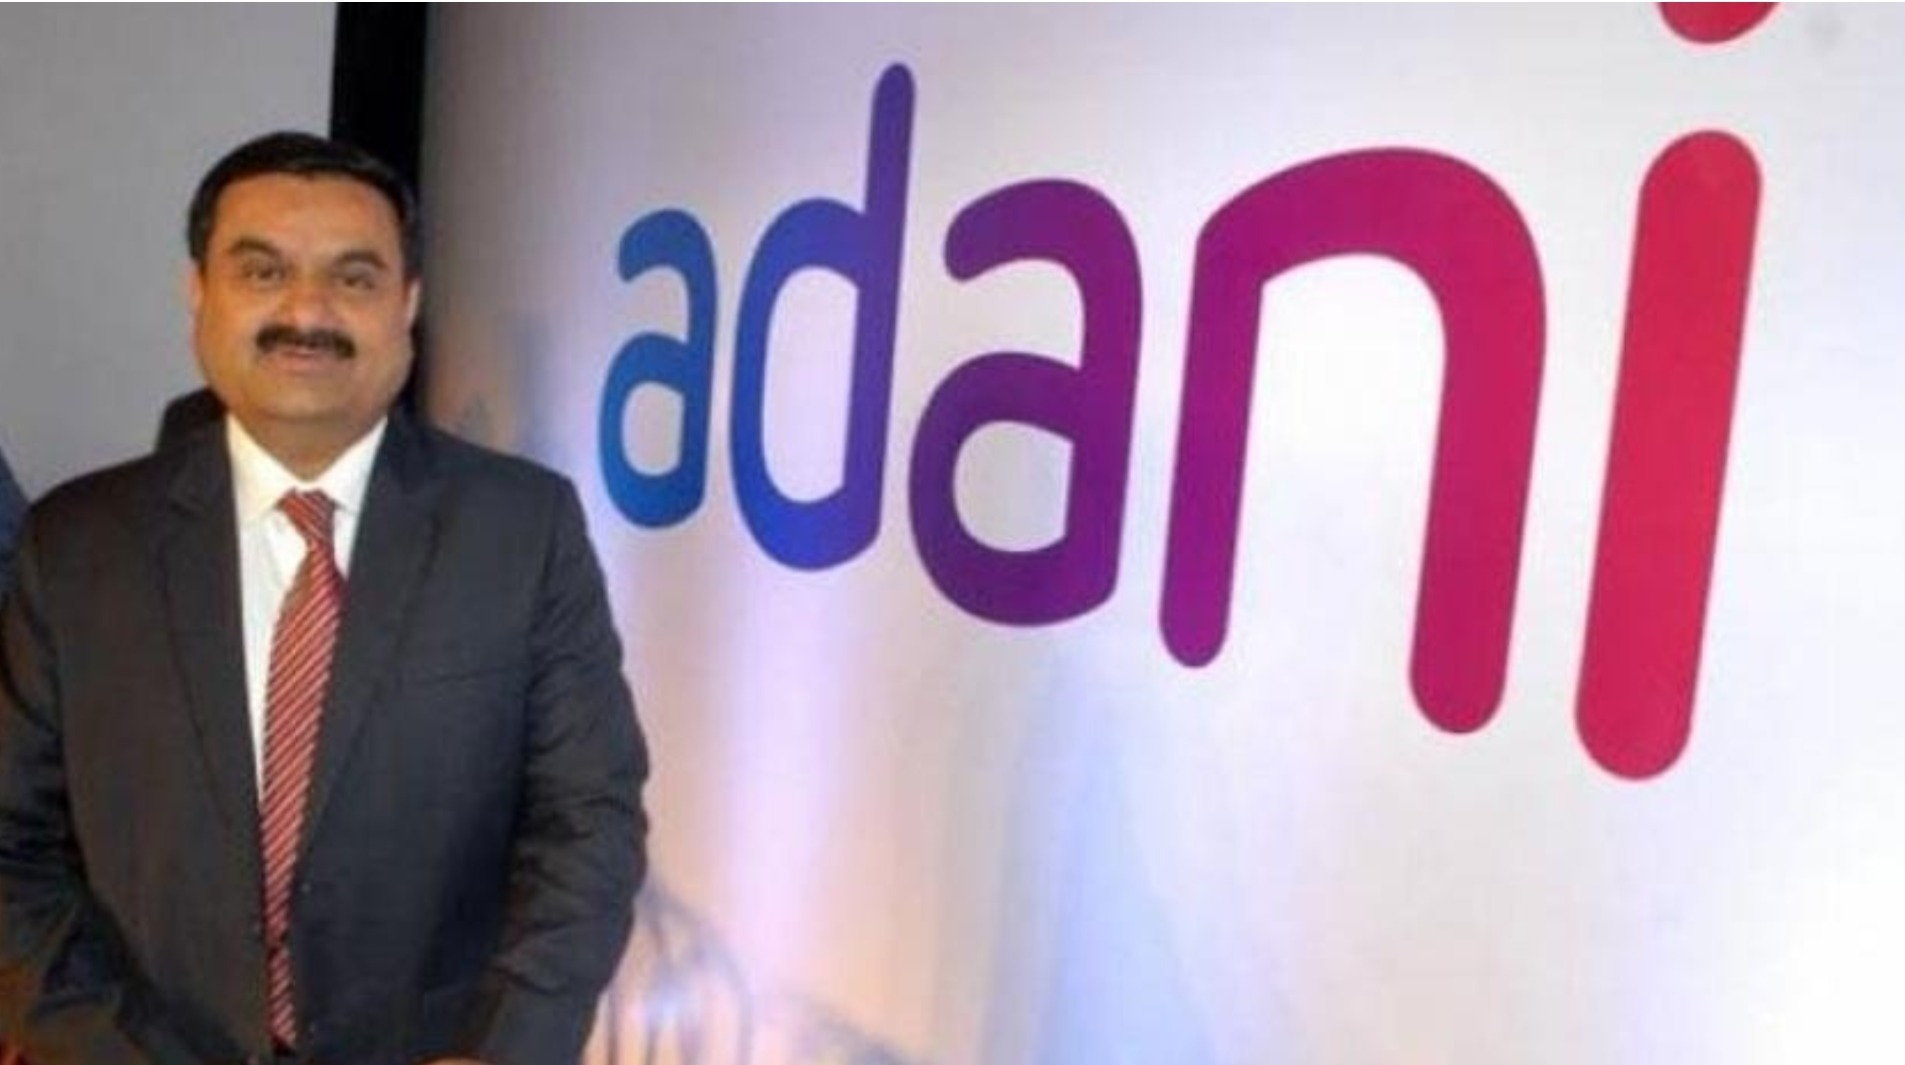 Adani group's acquisition of Kattupalli port to boost trade